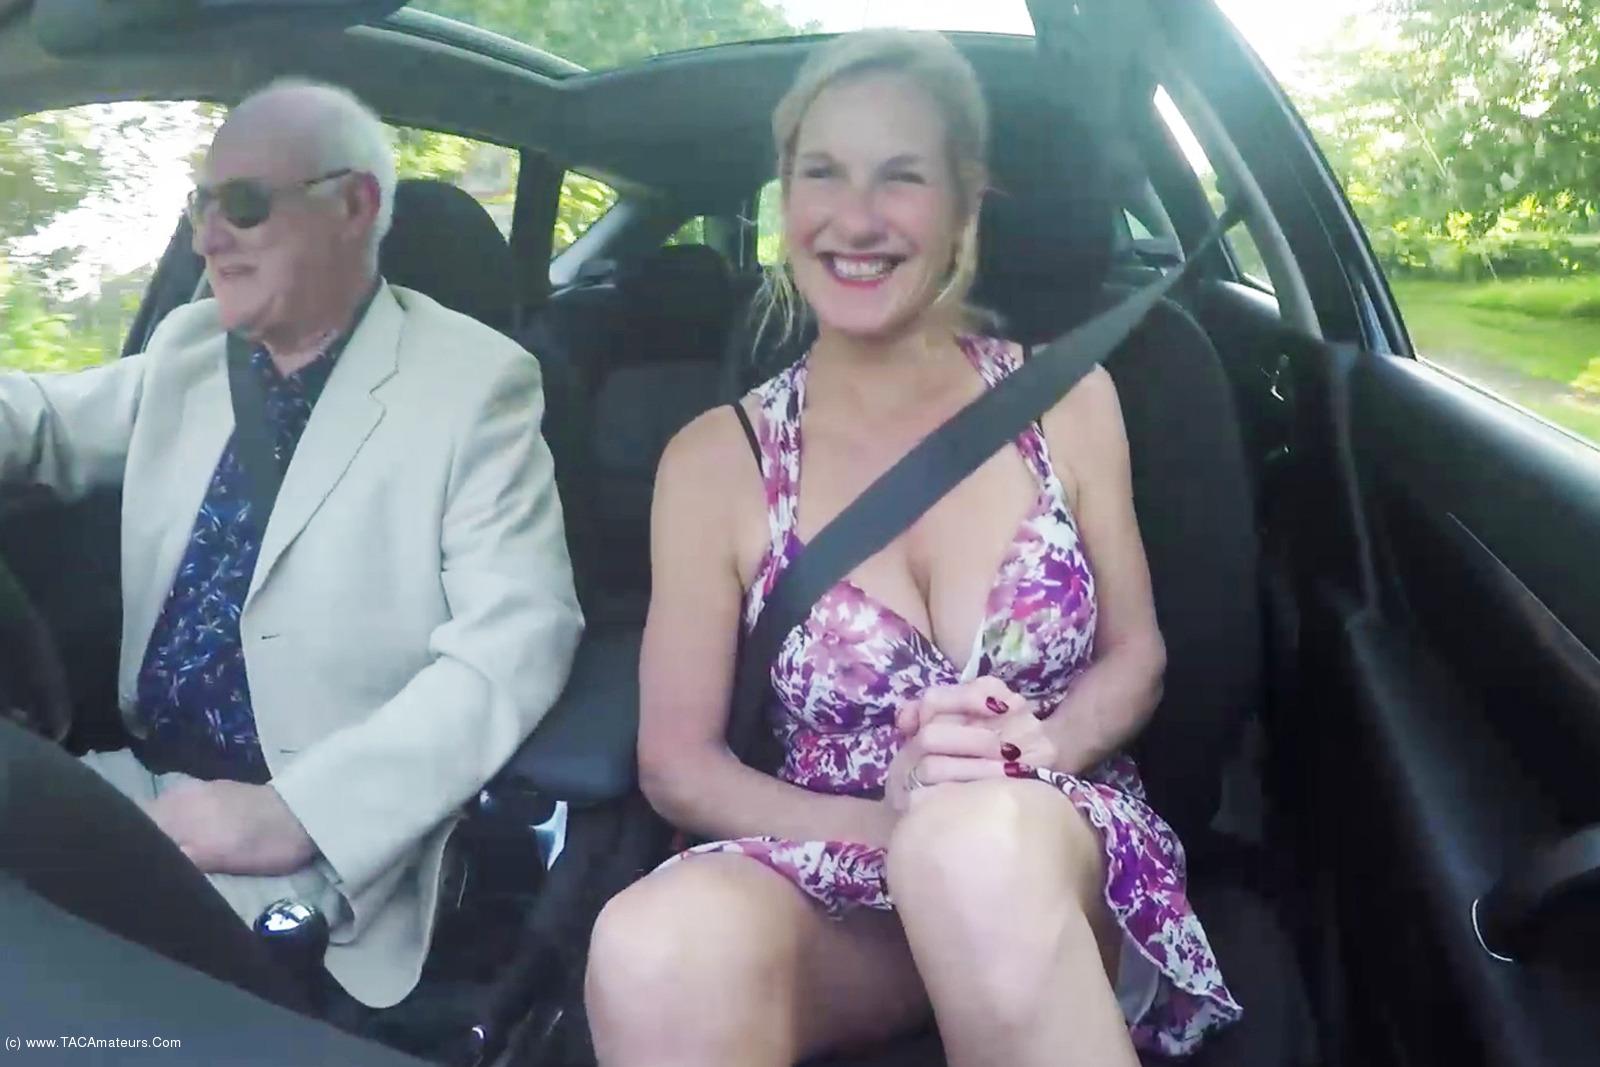 MollyMILF - Flashing In The Car scene 0